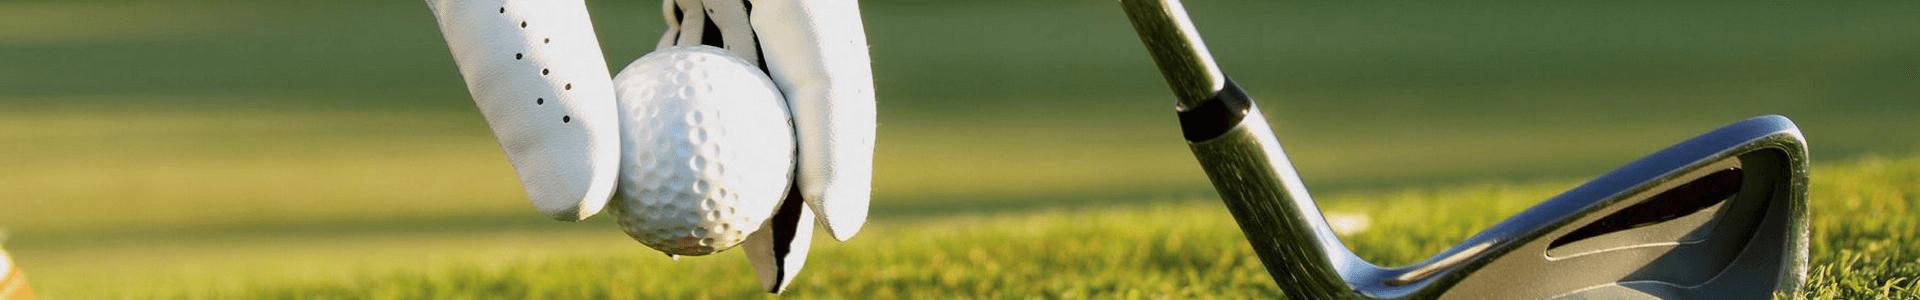 Golf systems betting oregon casino sports betting